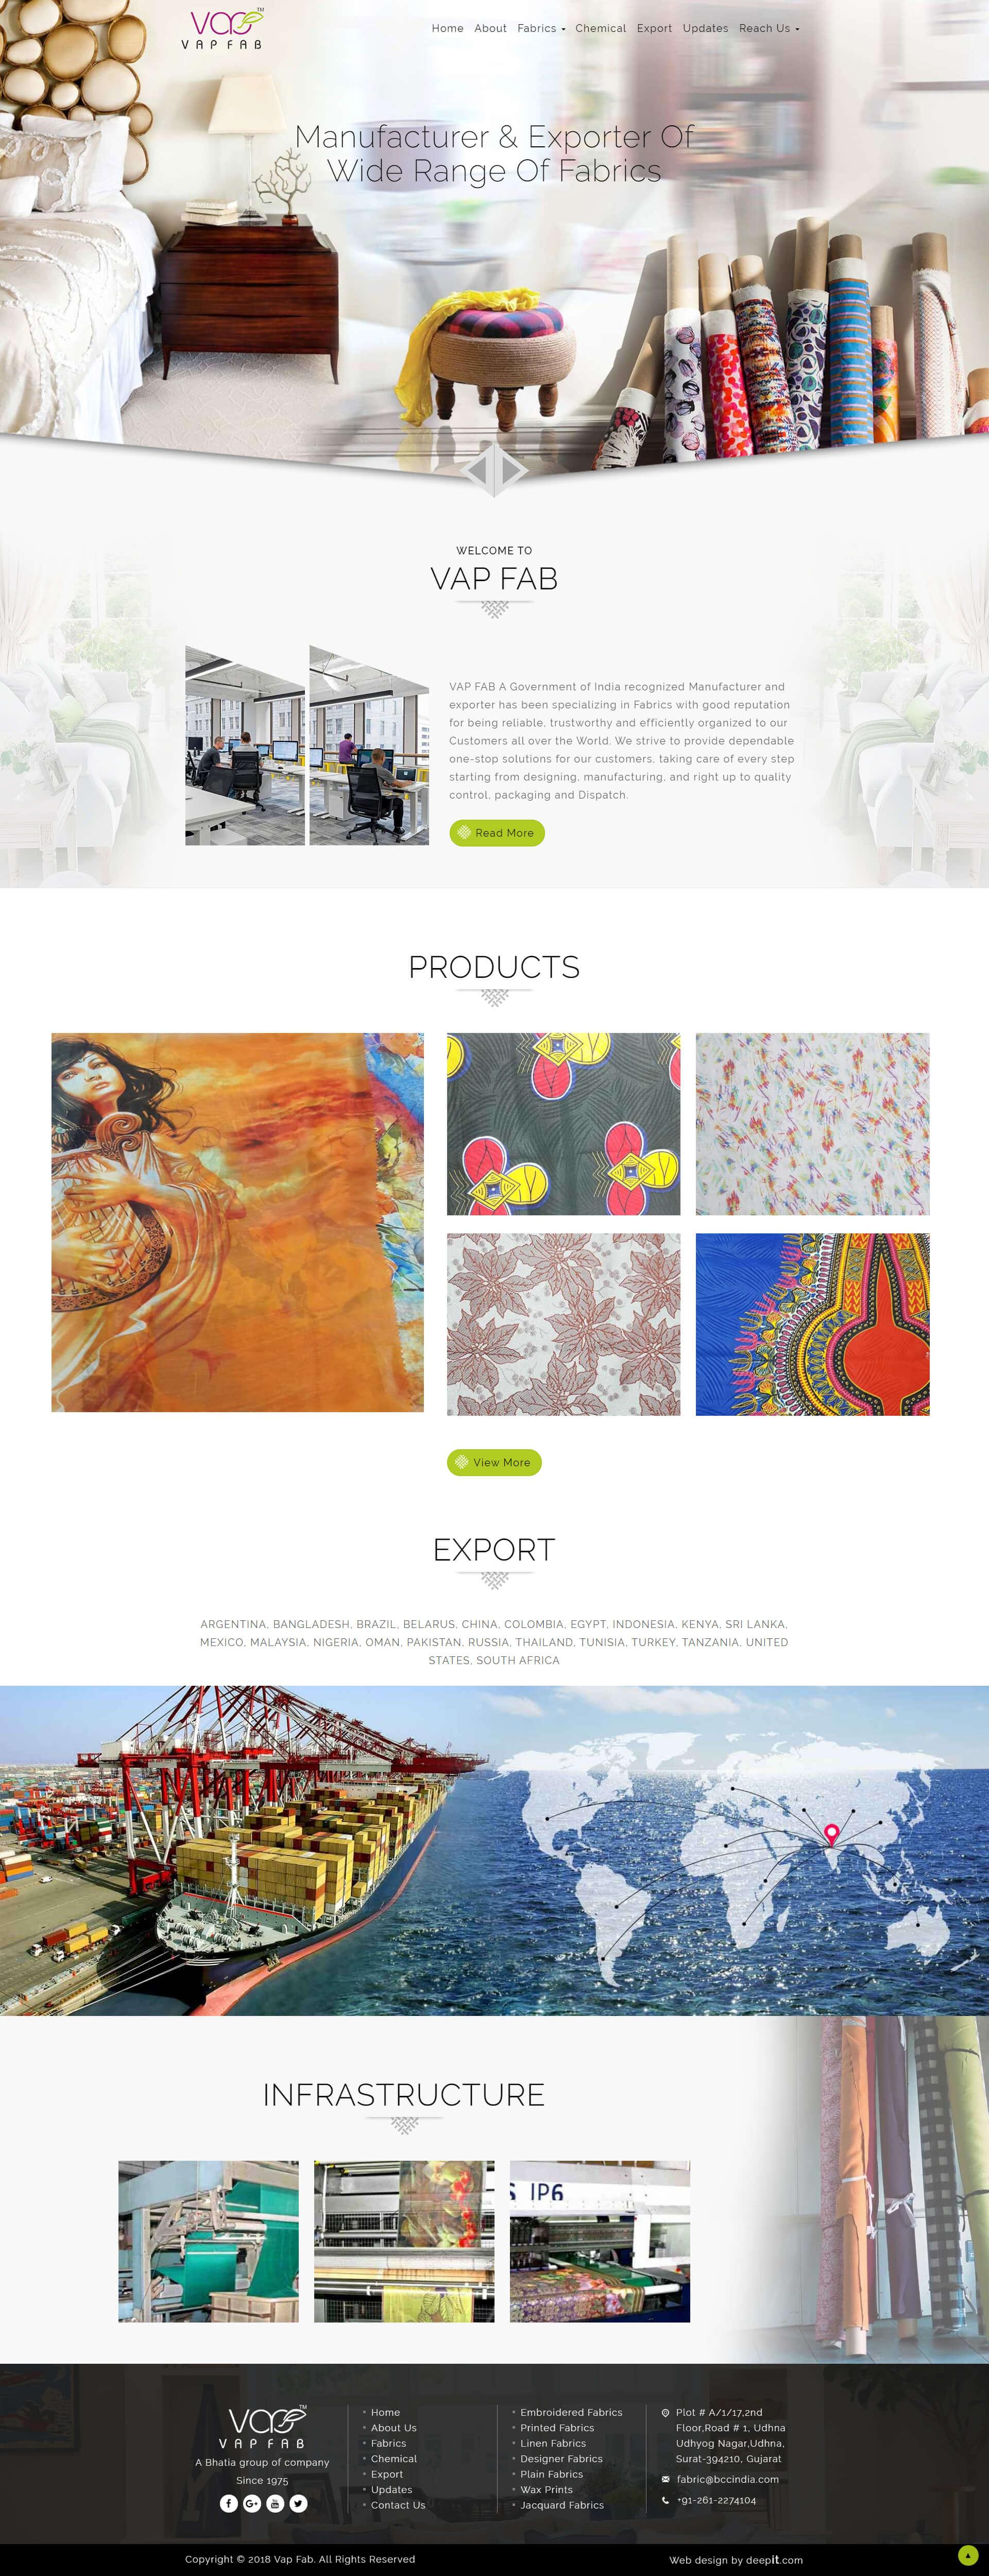 Bccindia Fabrics